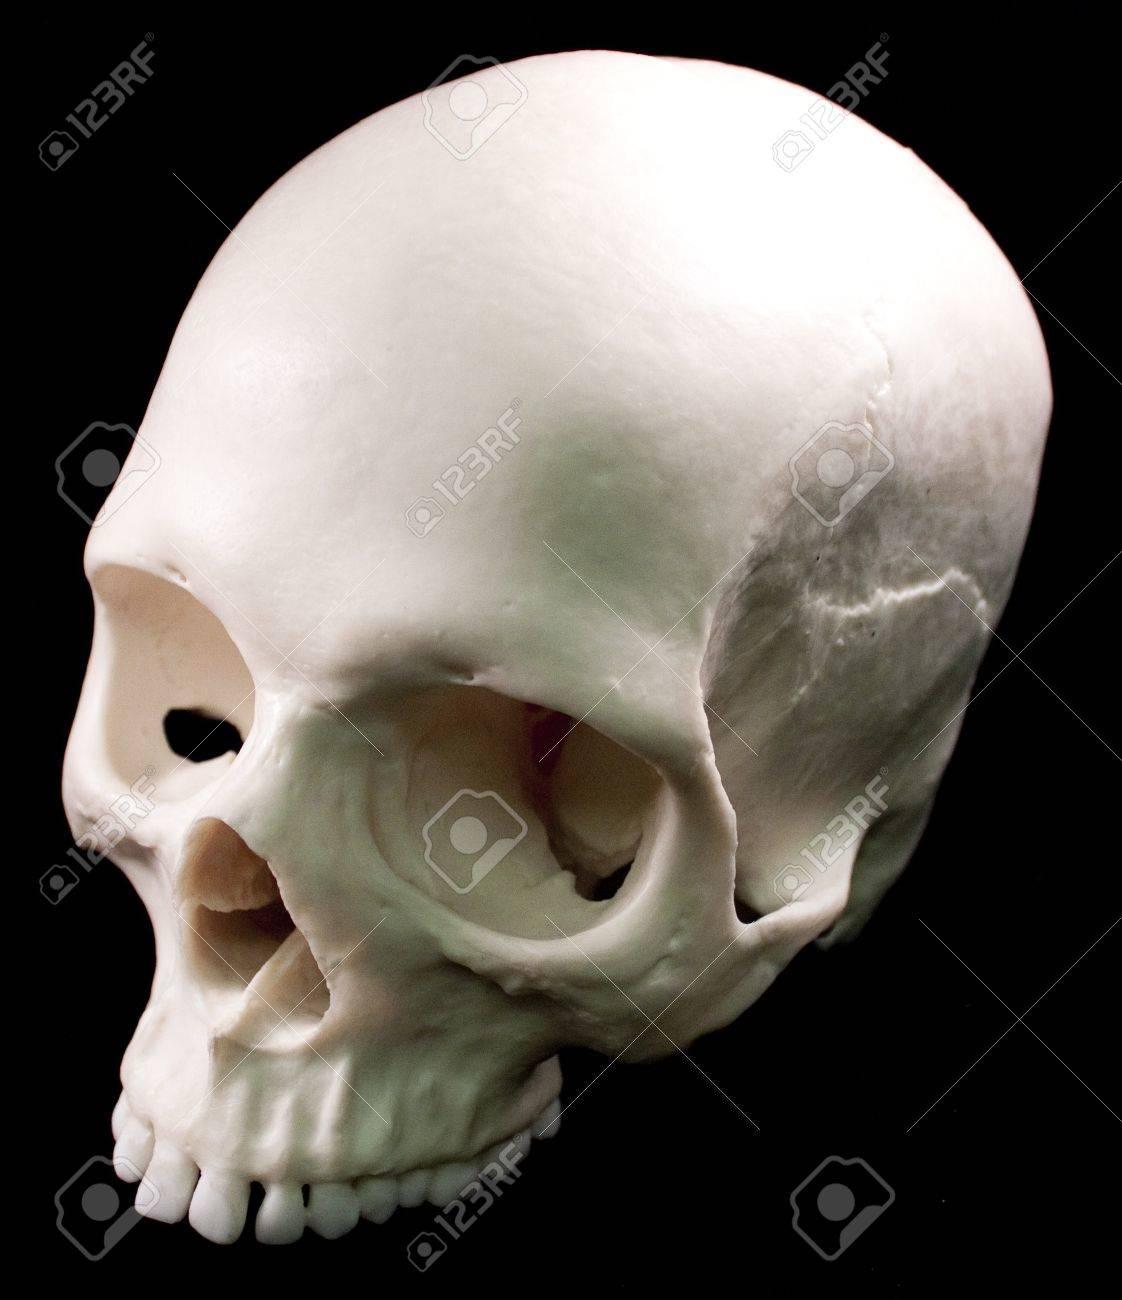 Human Skull Bone Head Dead Teeth Spooky Scary Pirate Isolated